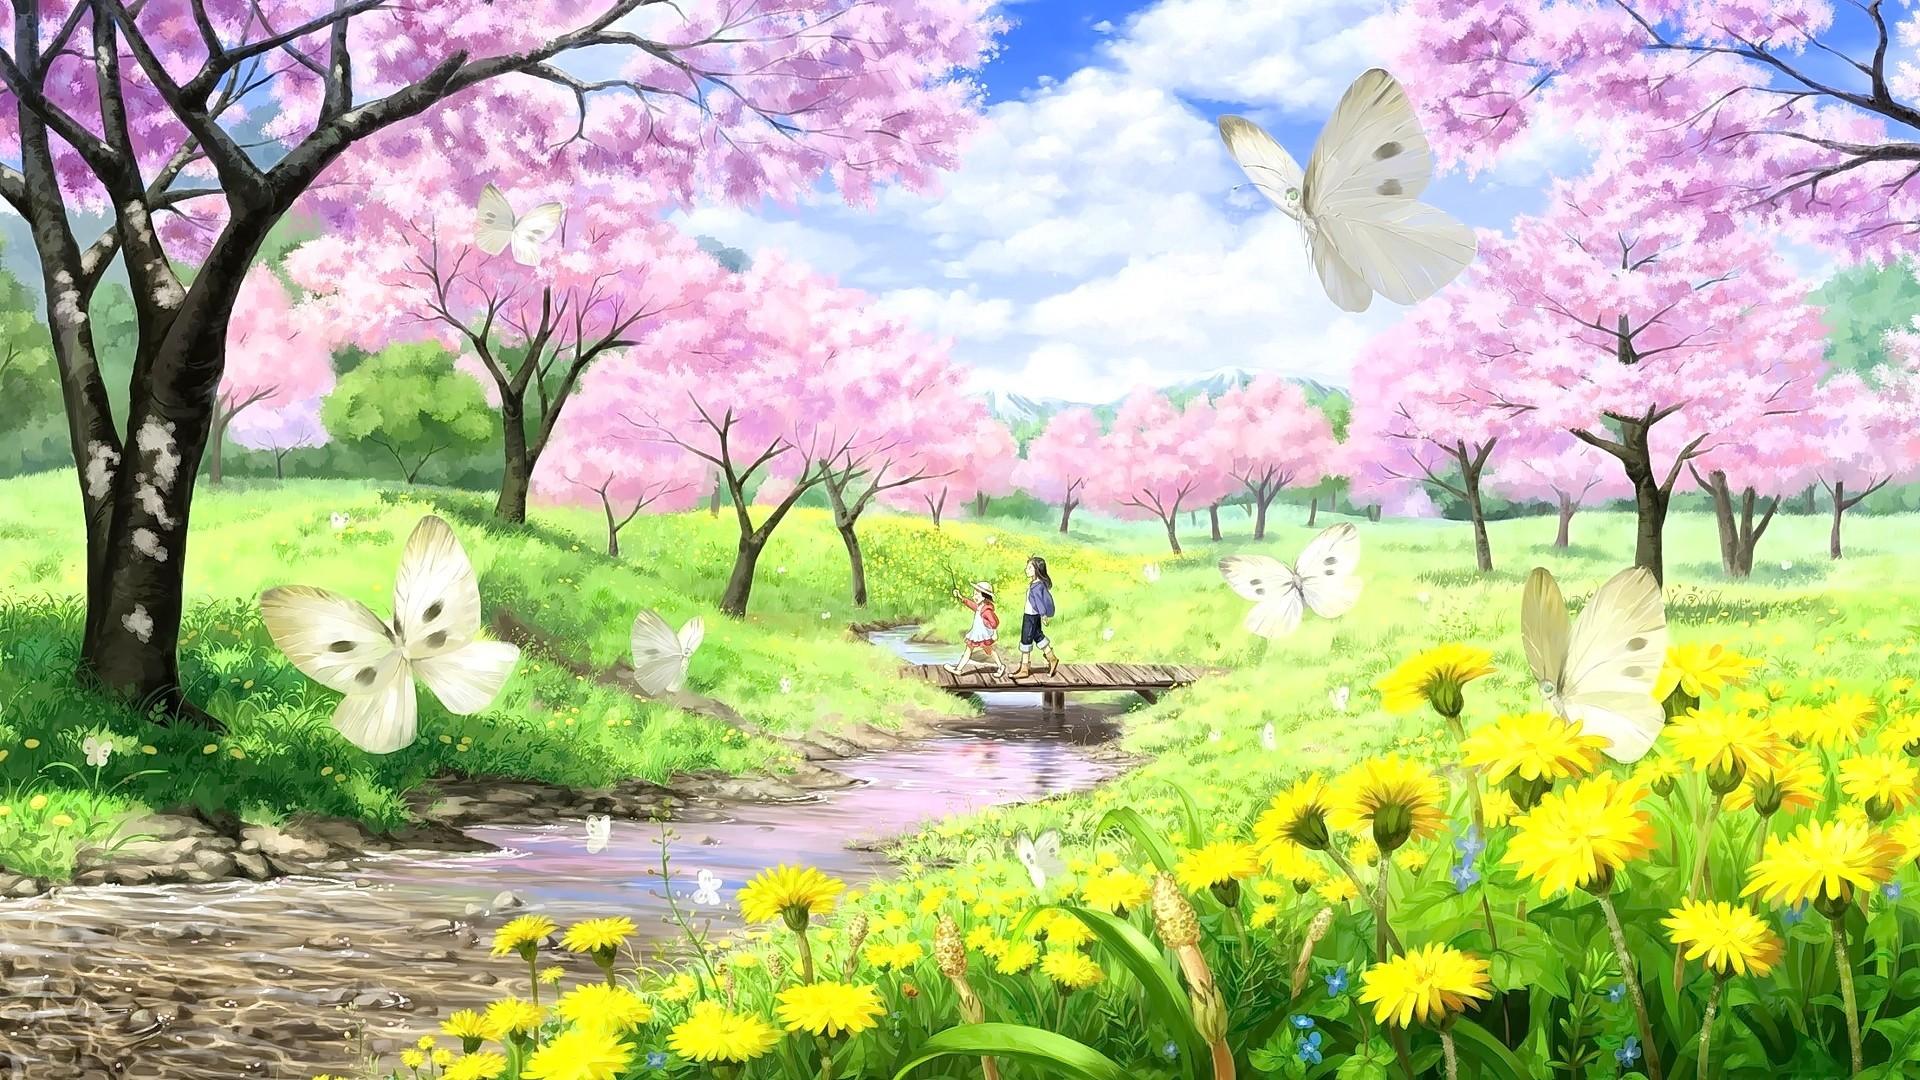 Anime anime anime girls long hair short hair butterfly cherry  blossom